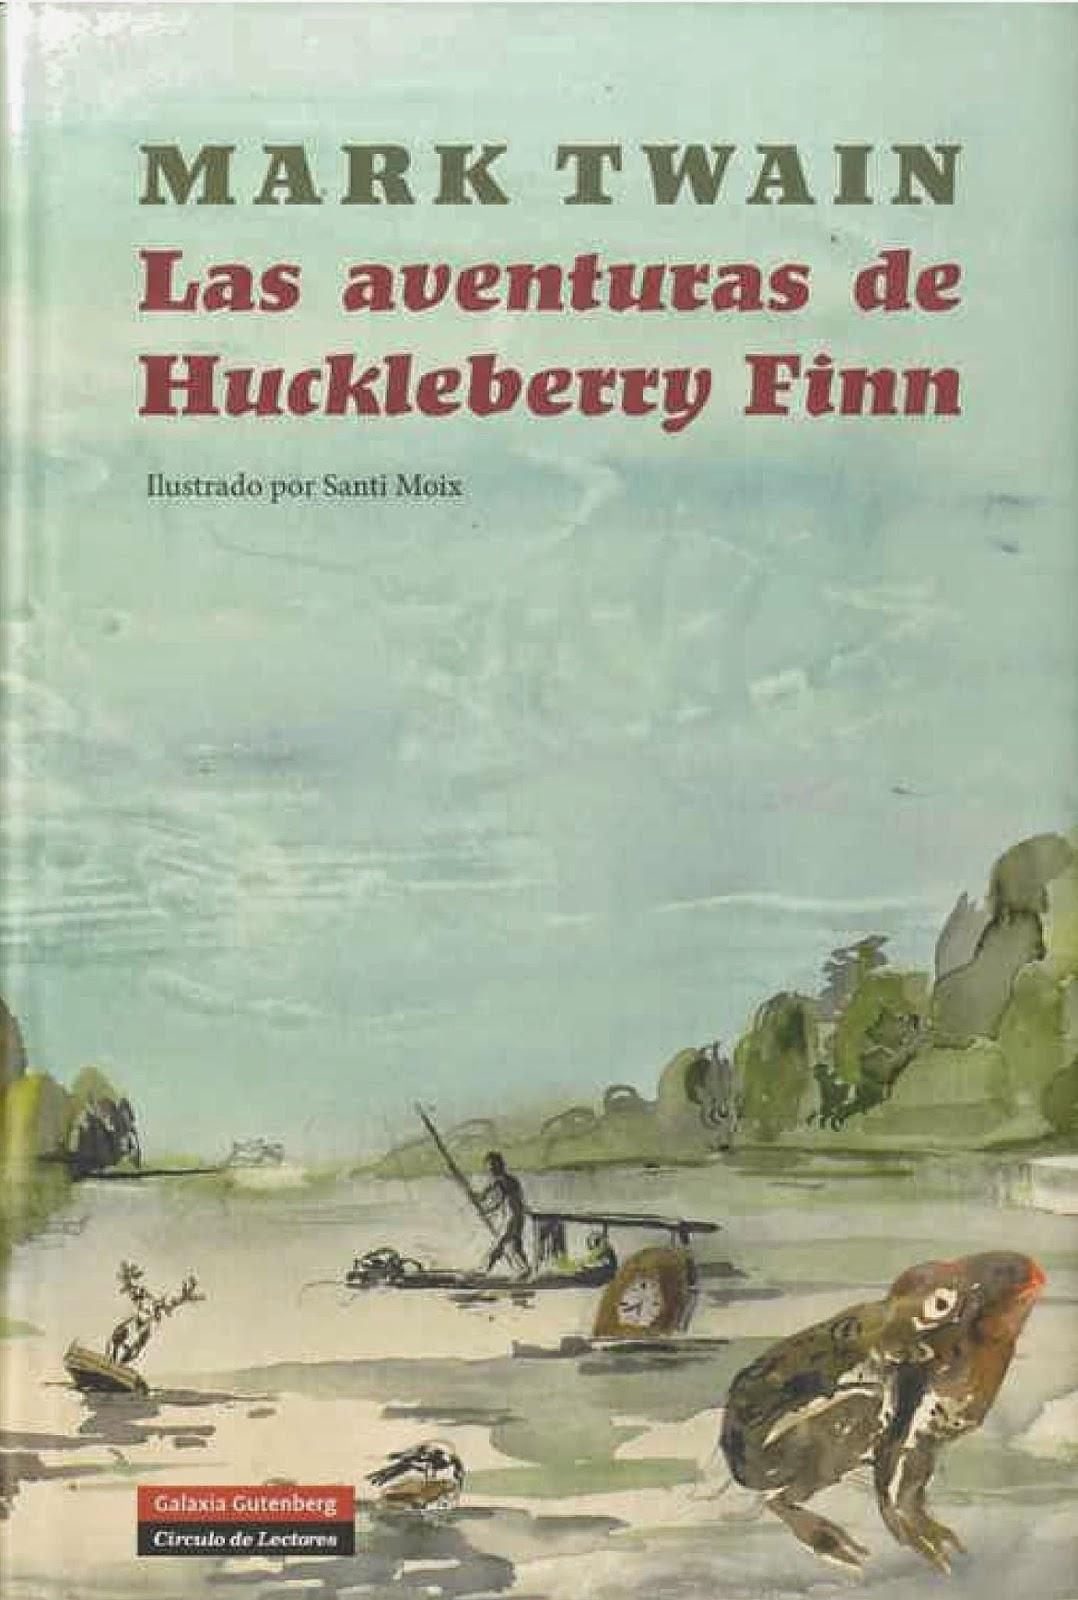 Las aventuras de Huckleberry Finn – Mark Twain